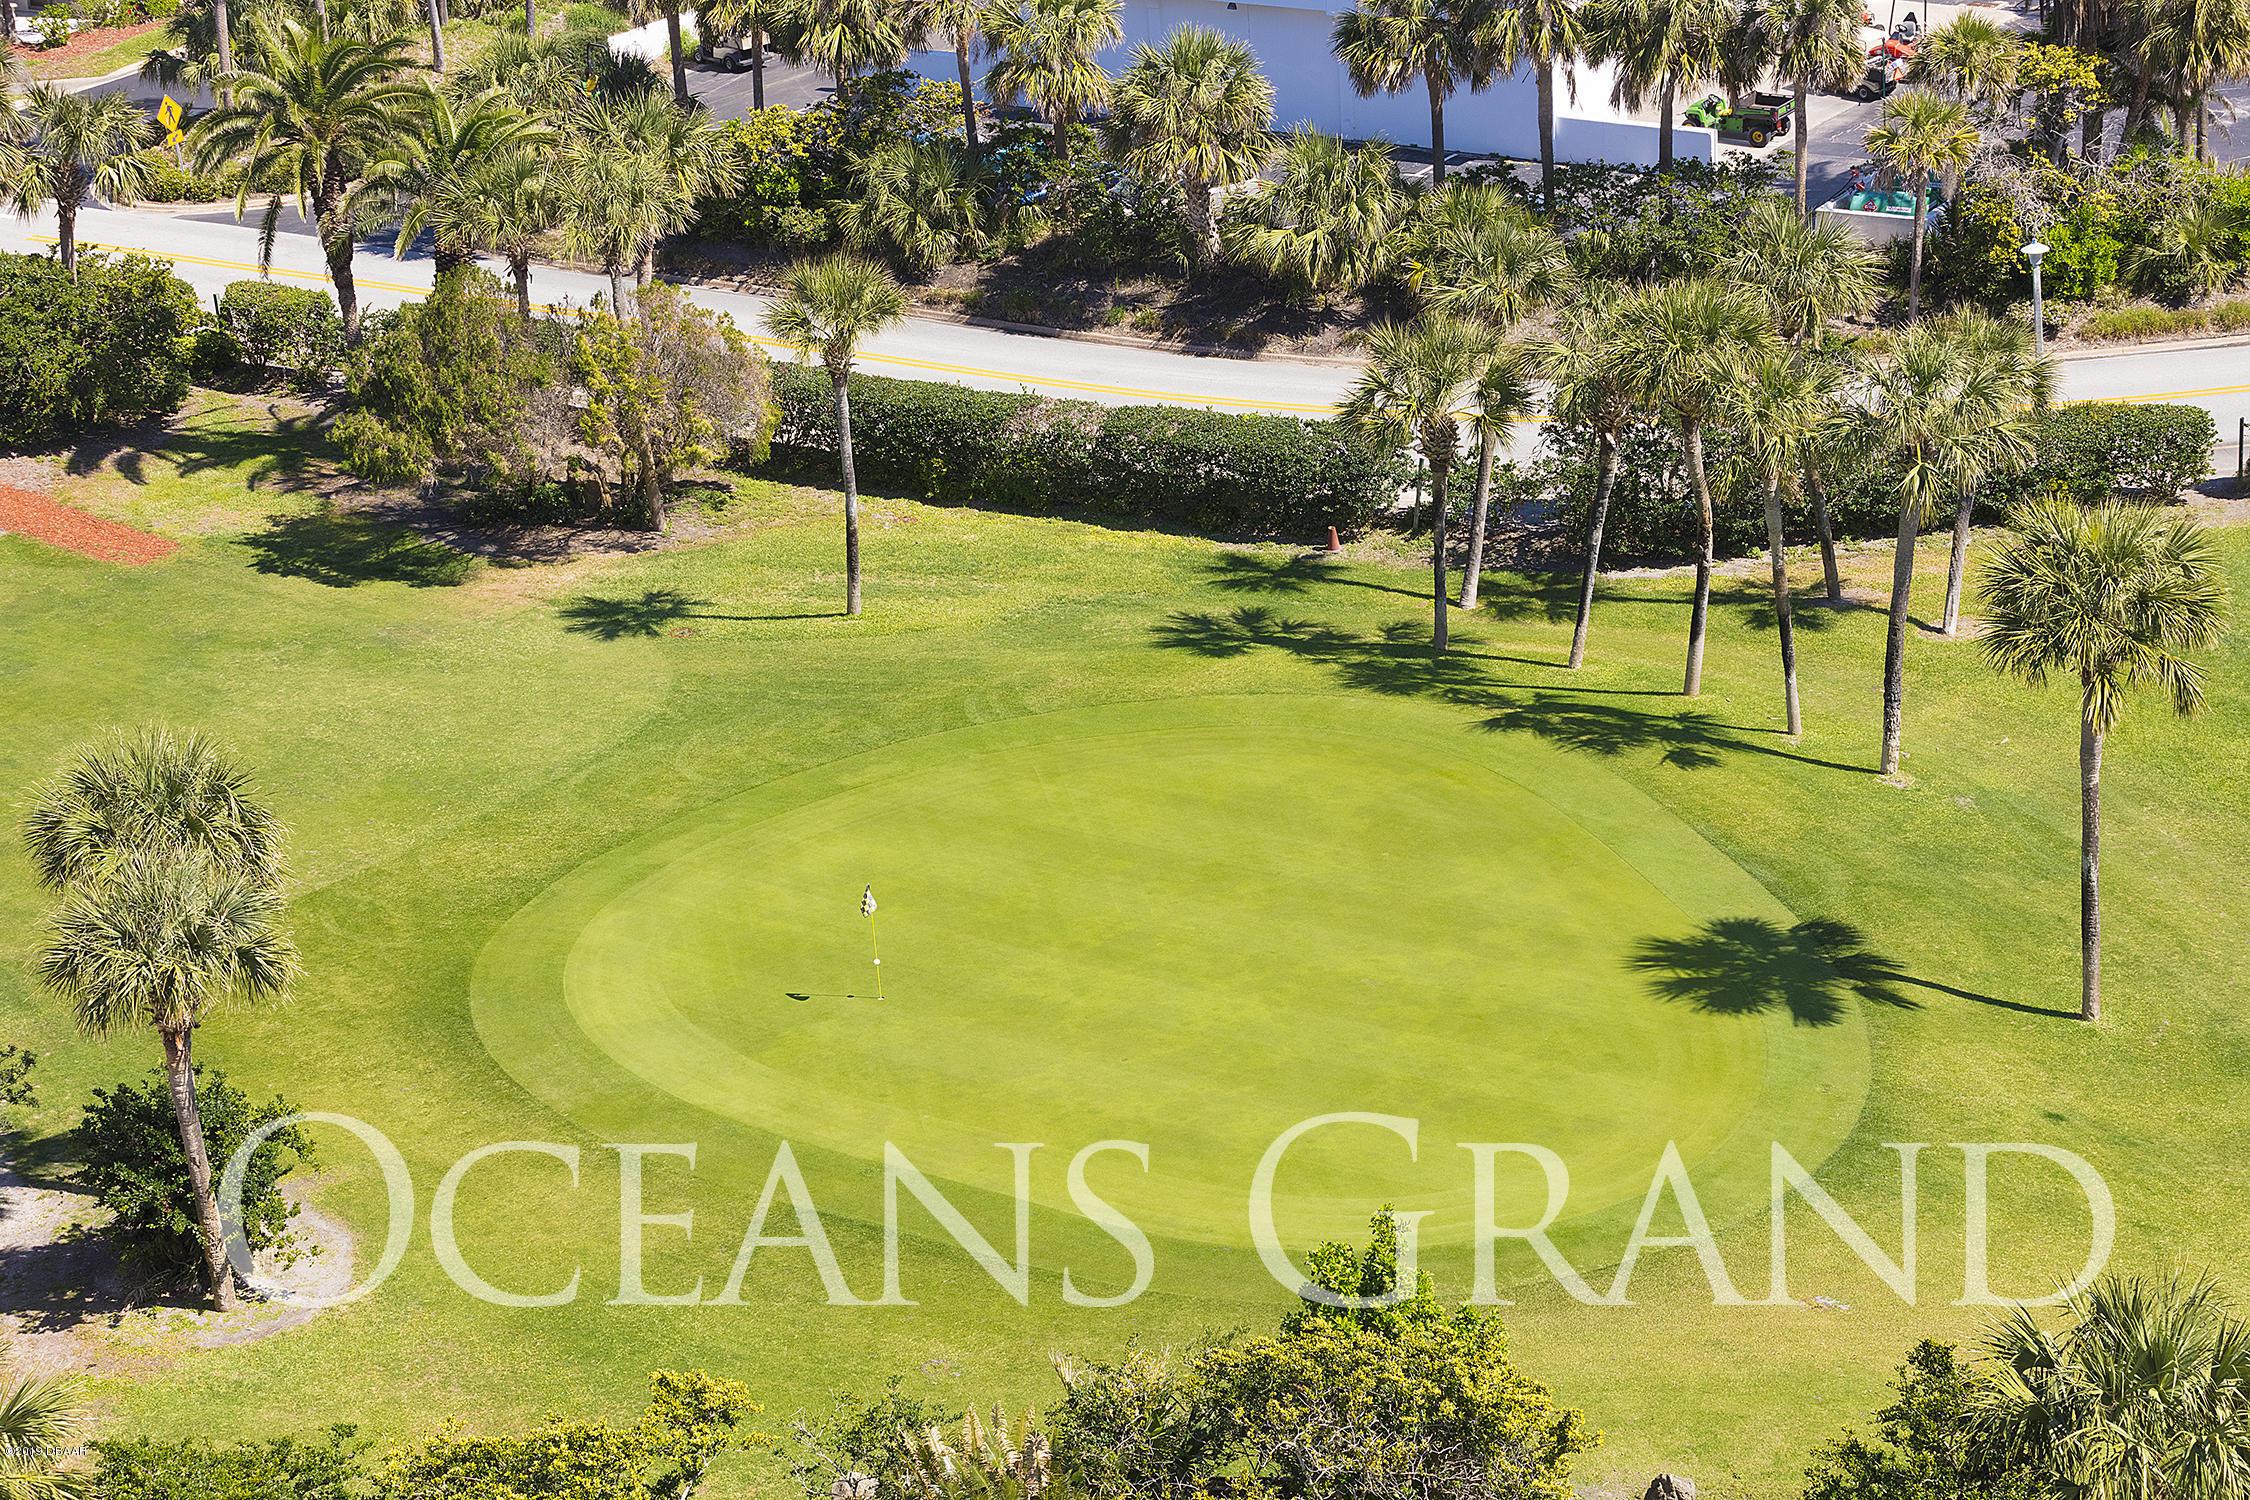 2 Oceans West Daytona Beach - 55